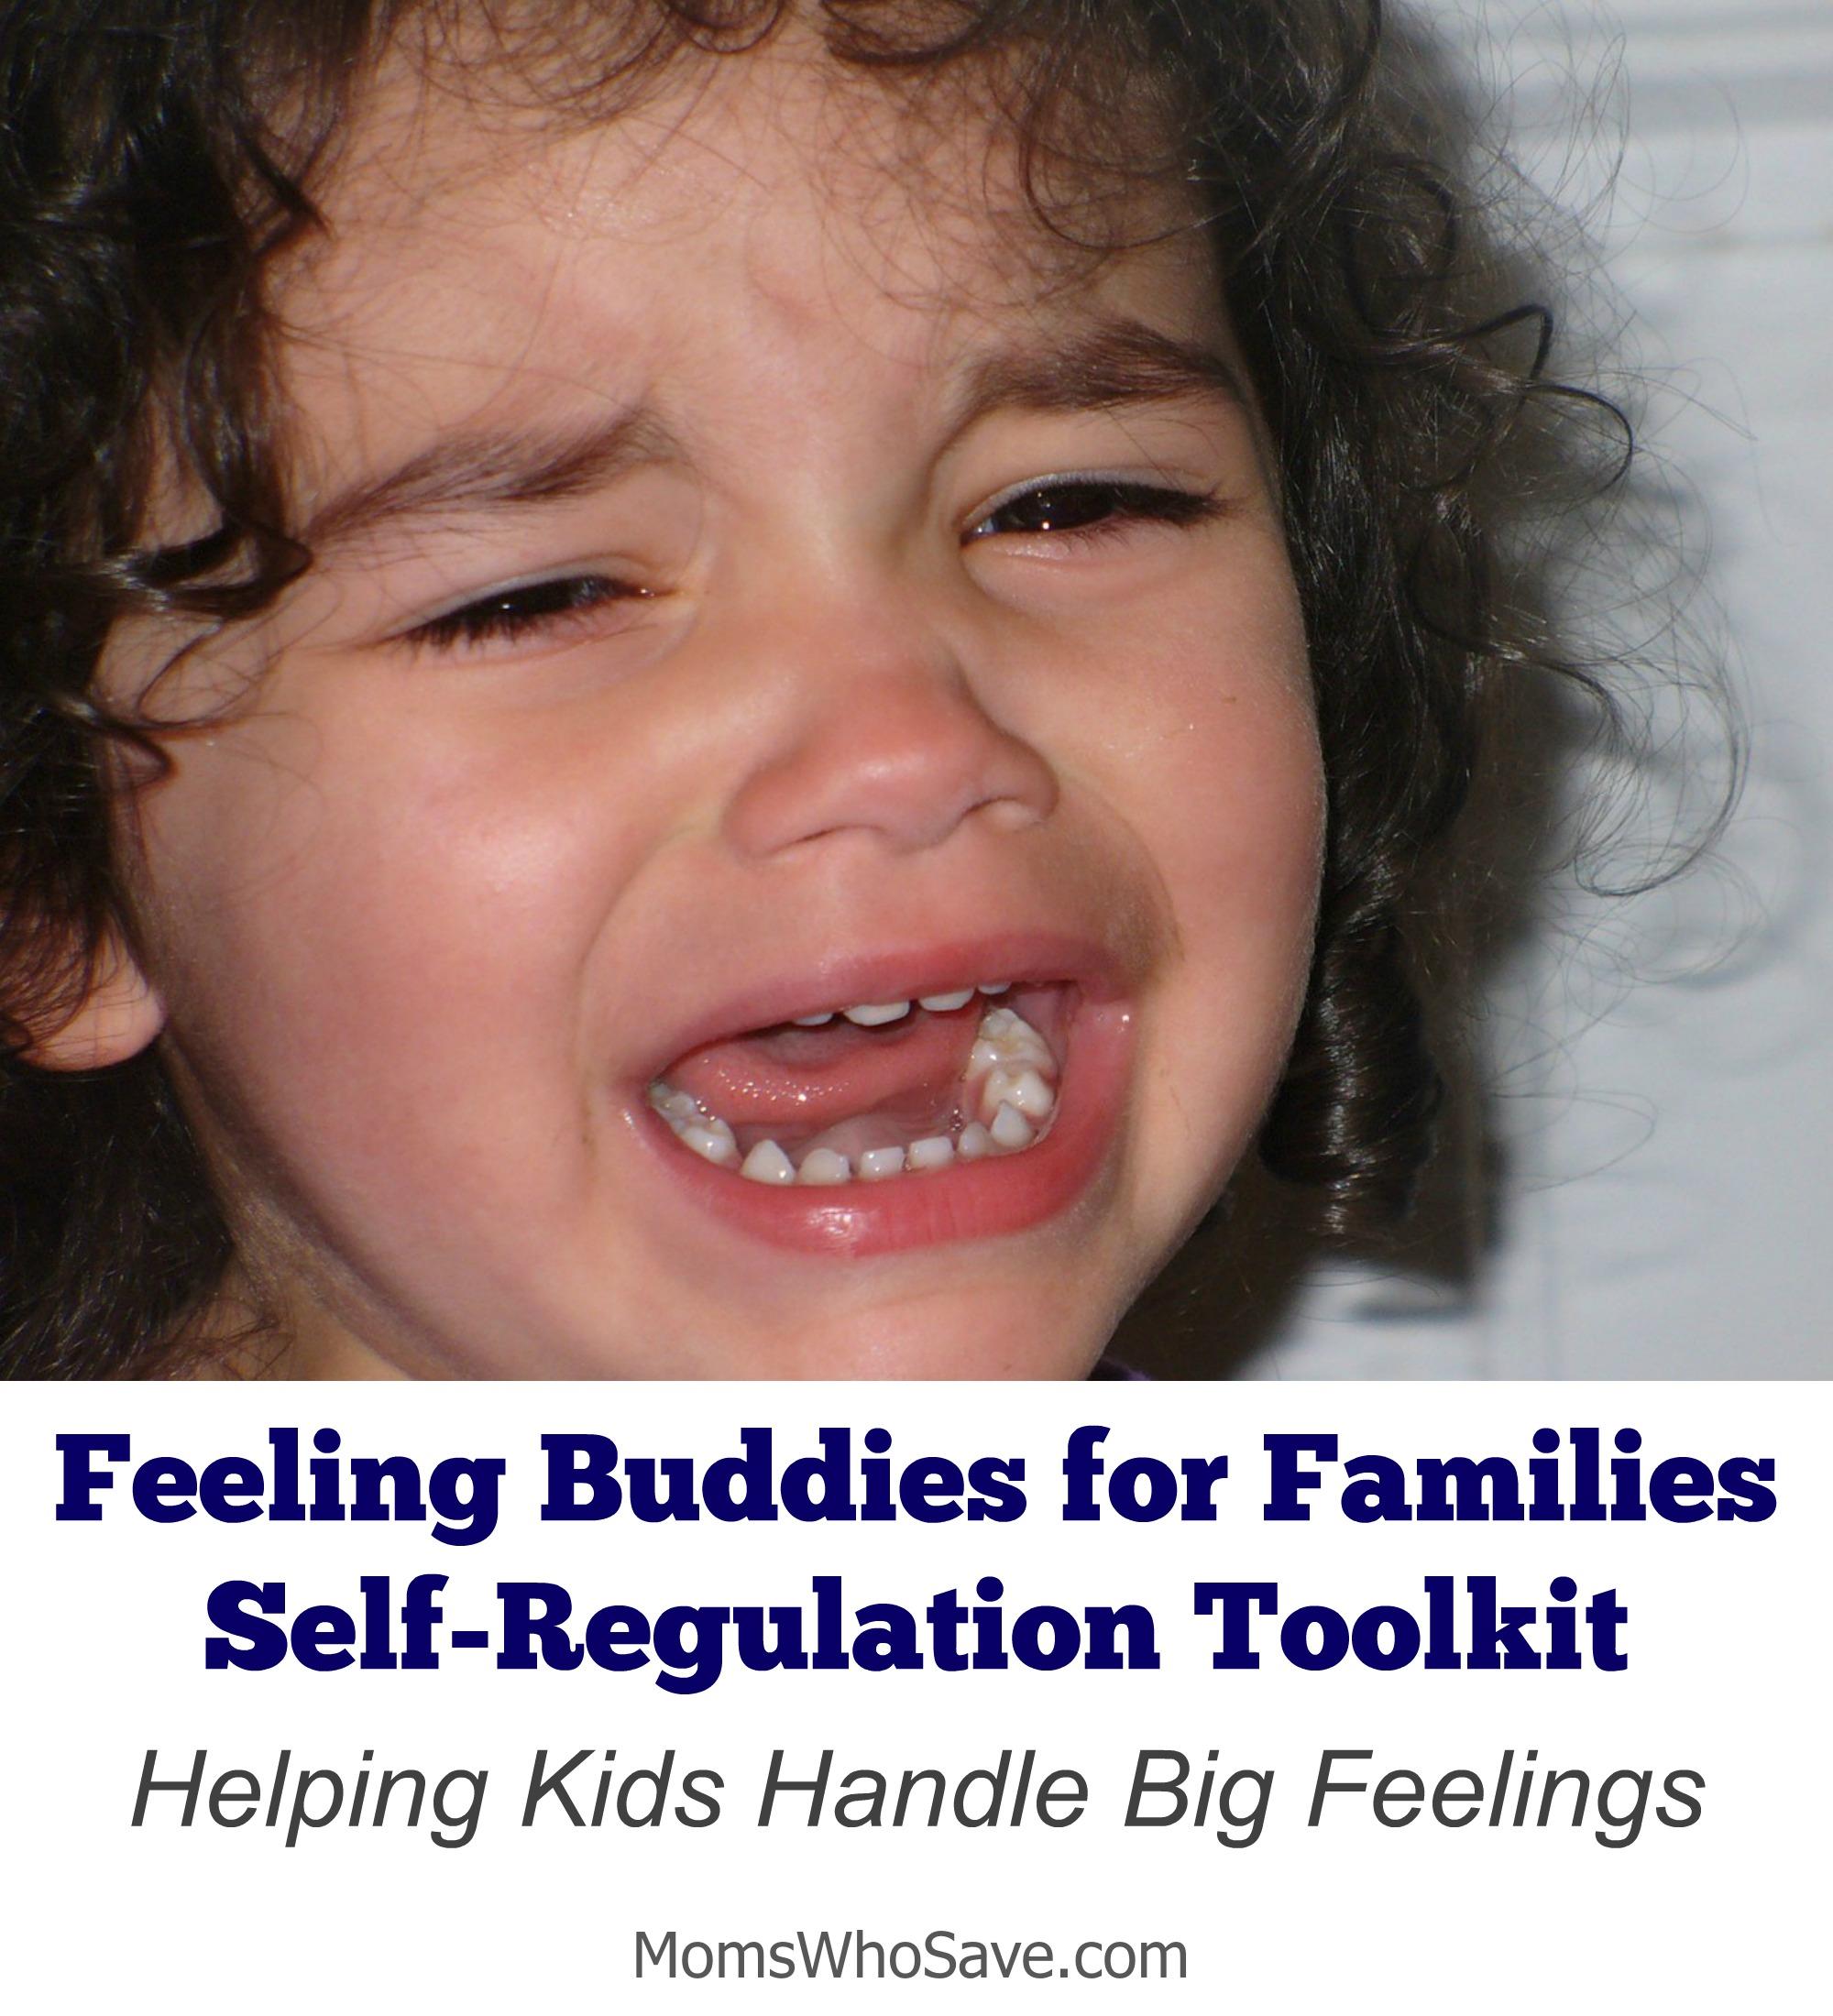 Feeling Buddies for Families Self-Regulation Toolkit — Helping Kids Handle Big Feelings